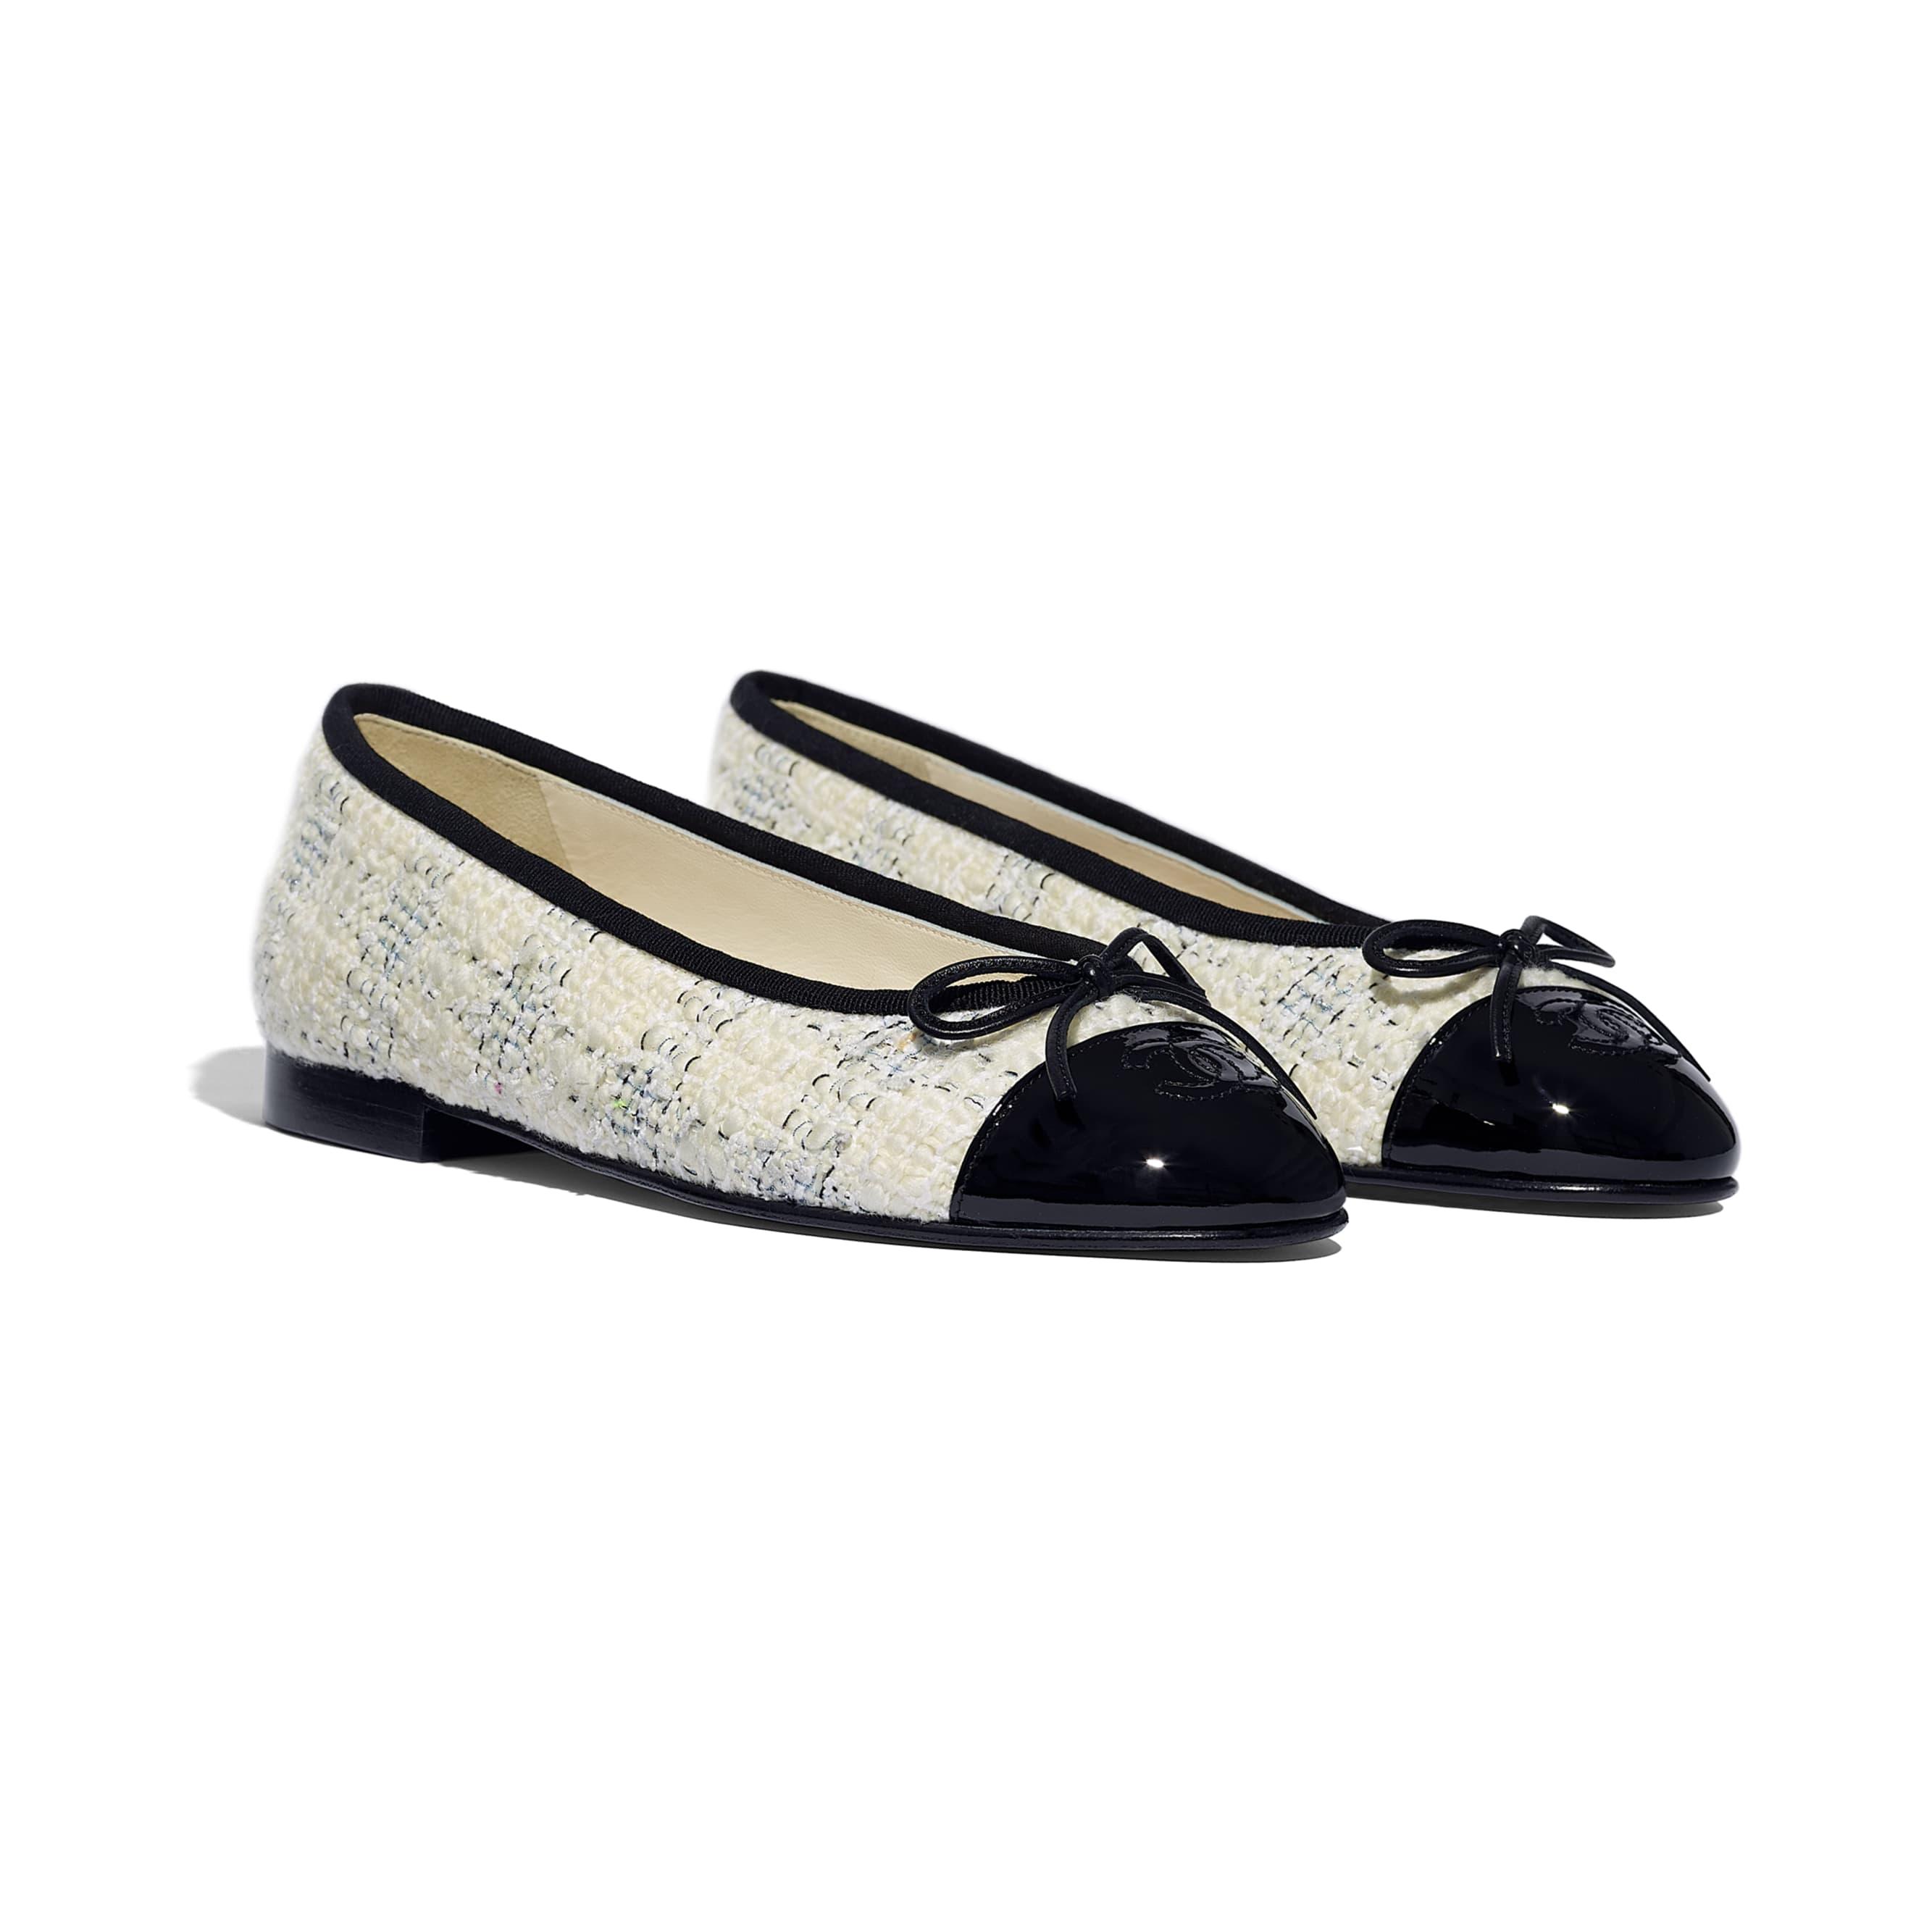 Ballerinas - Ecru, Blue & Black - Tweed & Patent Calfskin - Alternative view - see standard sized version